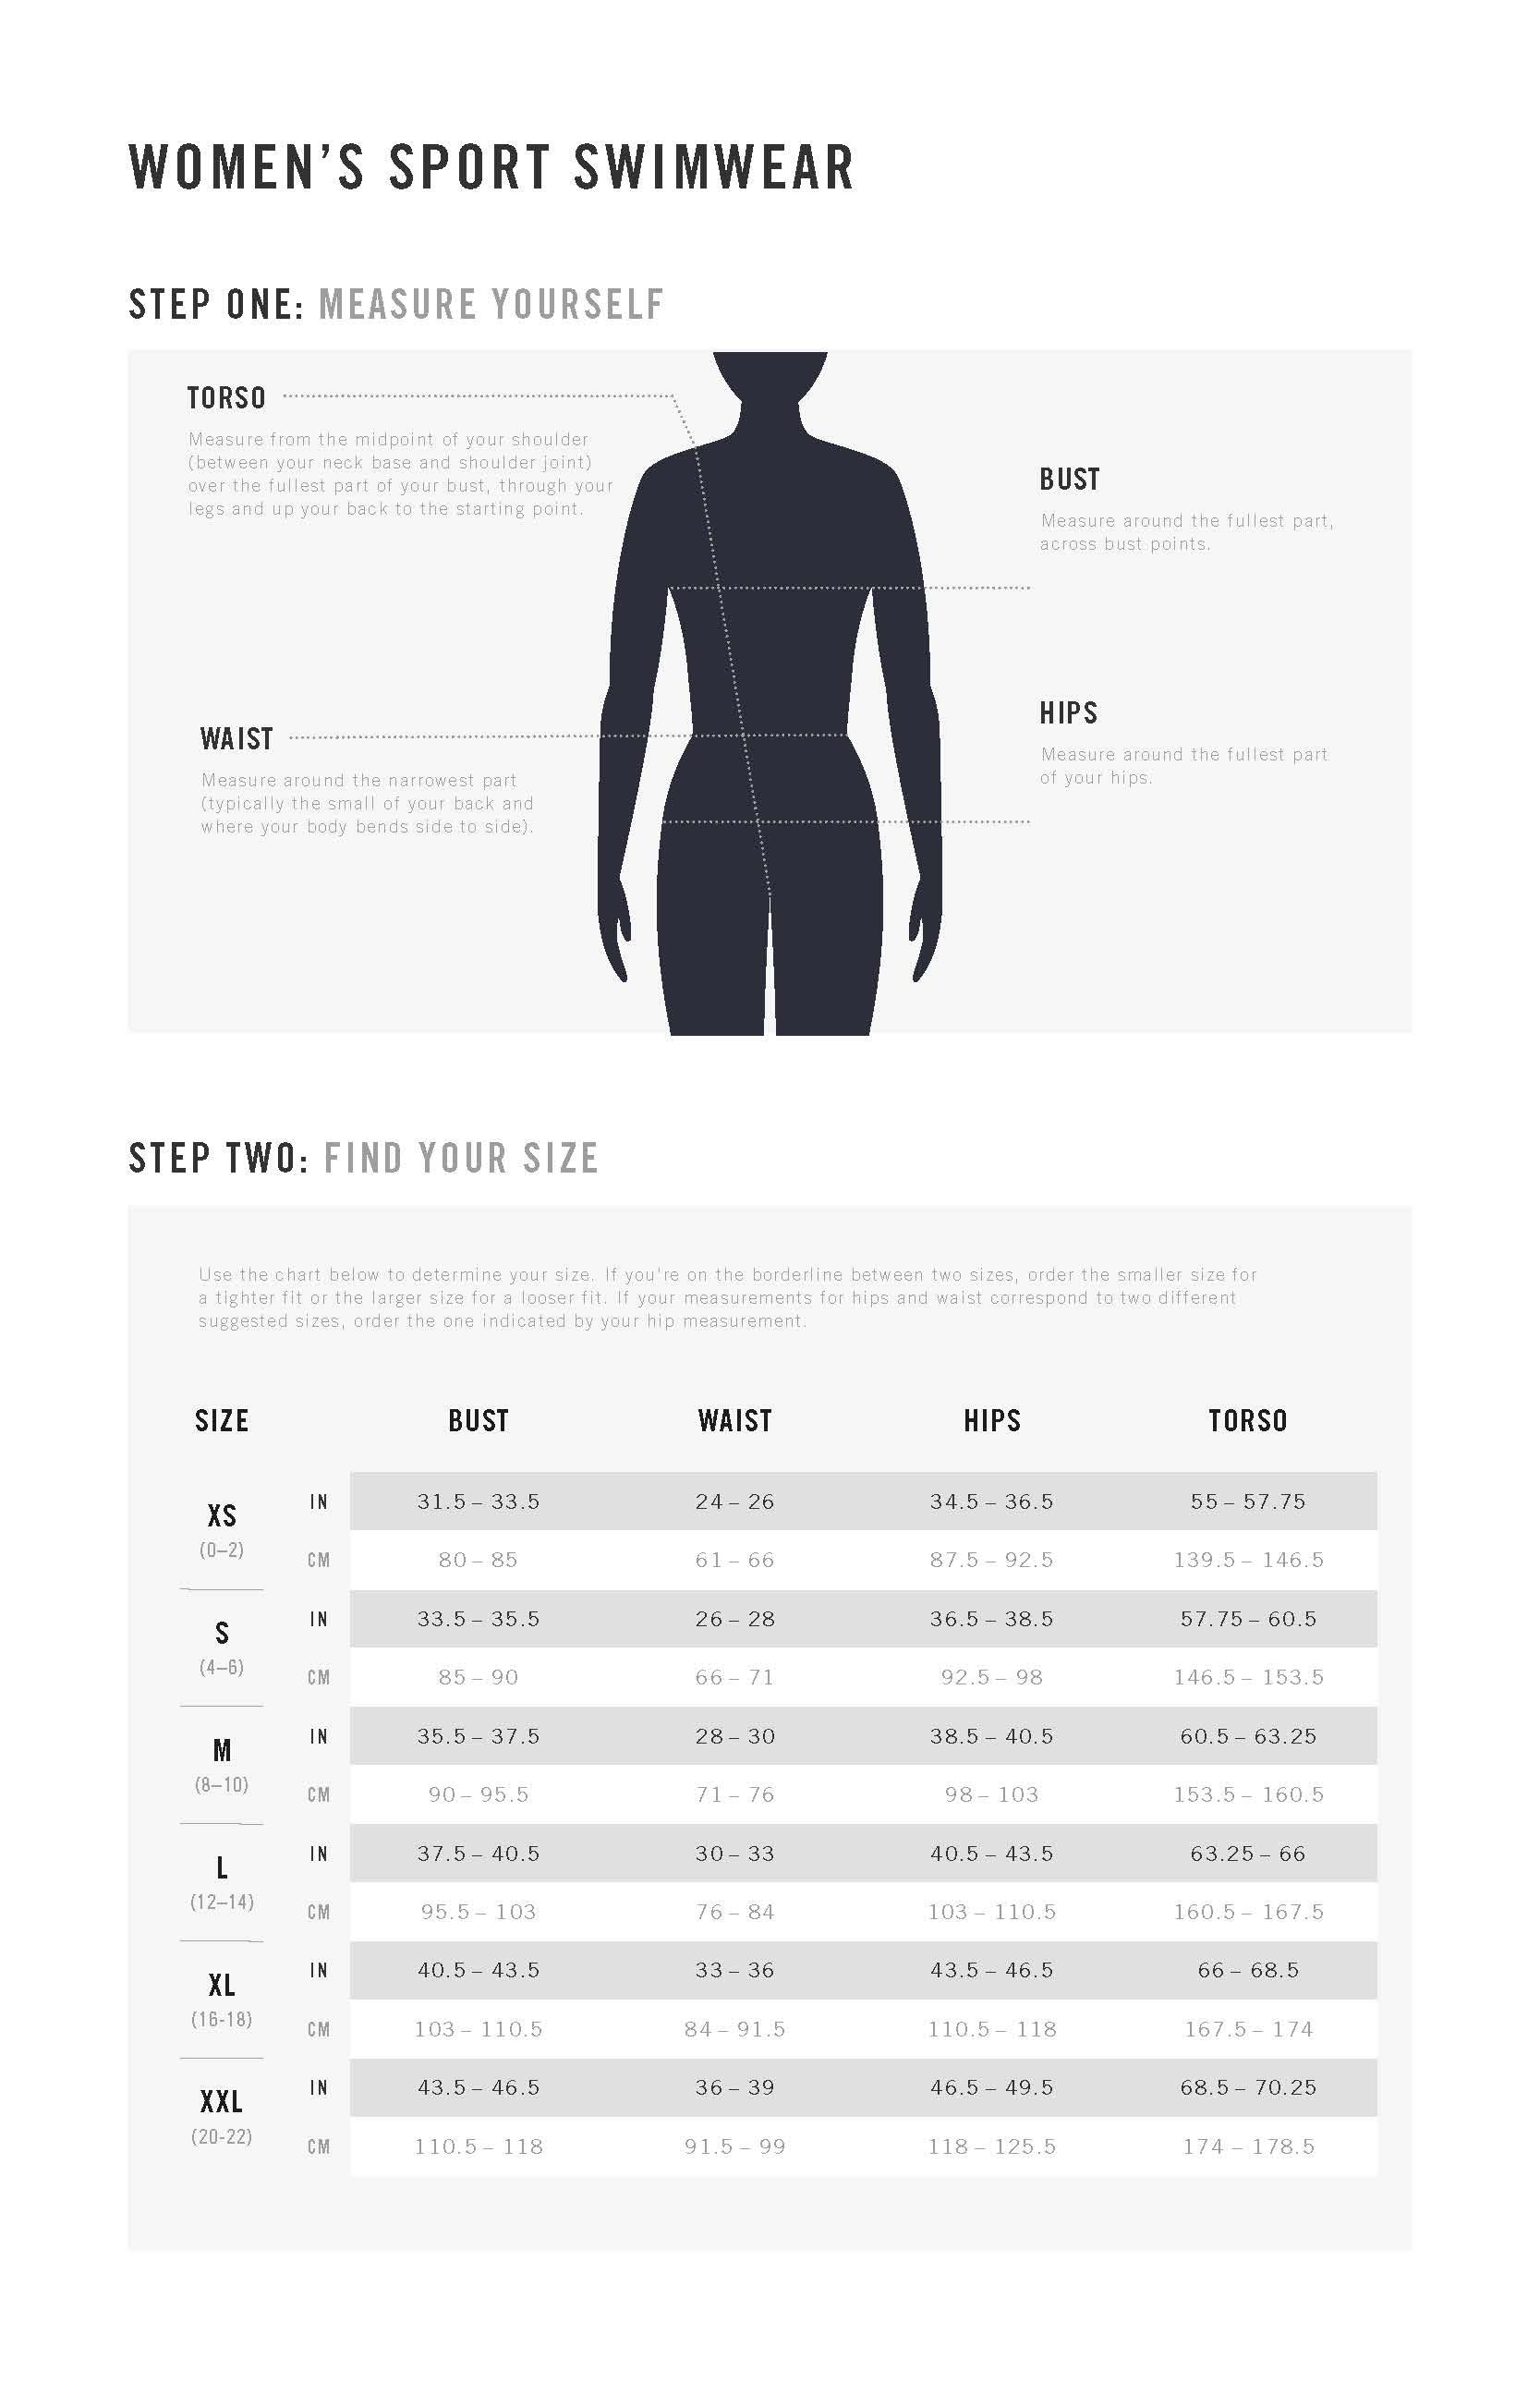 Storleksguide Nike Köp online hos Intersport